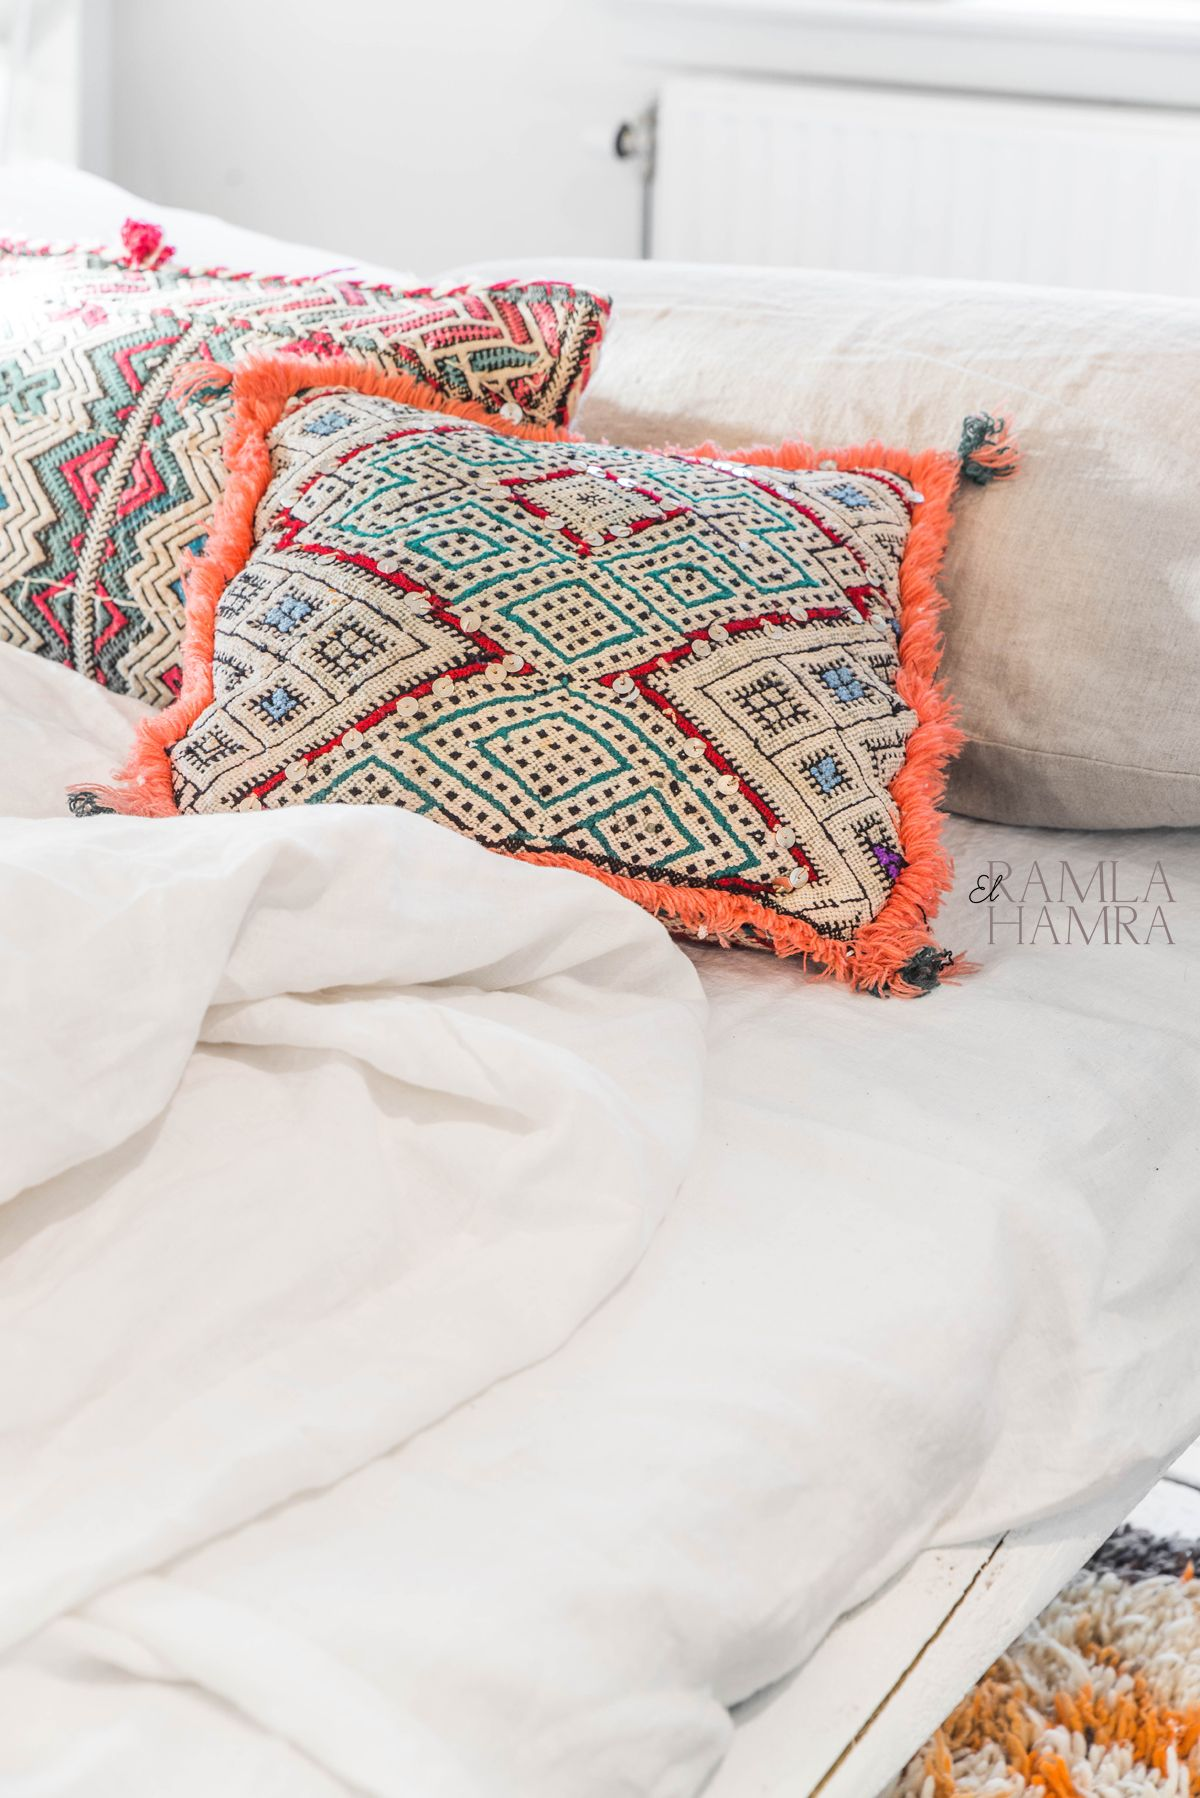 M s de 25 ideas incre bles sobre bed cushions en pinterest for Dormitorio king